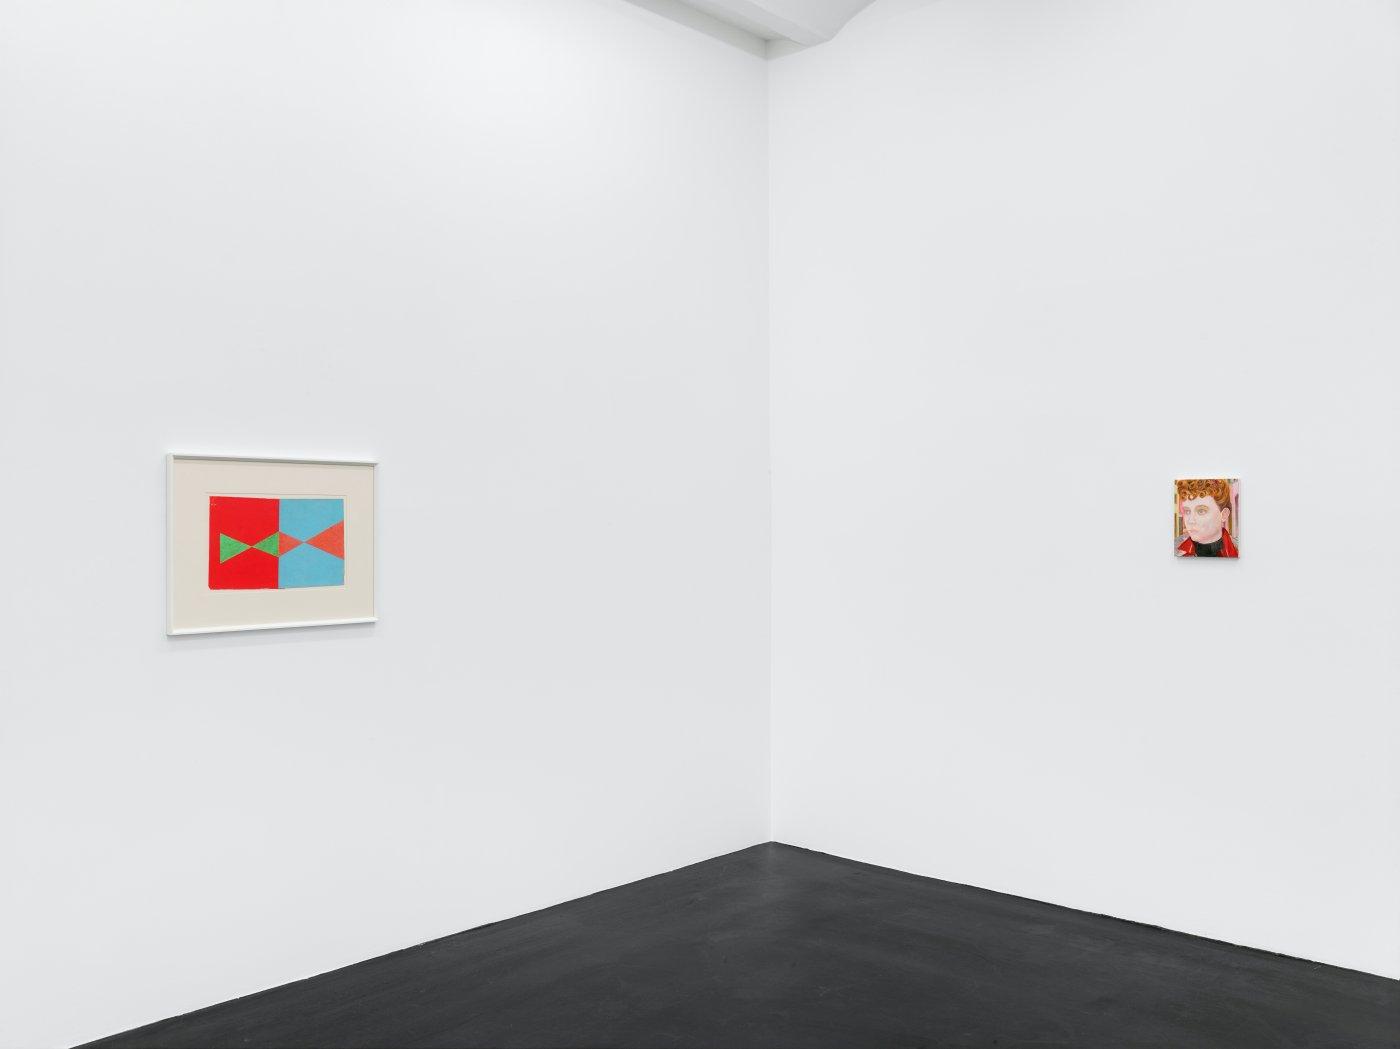 Galerie Buchholz Cologne Lukas Duwenhogger Katharina Wulff 7